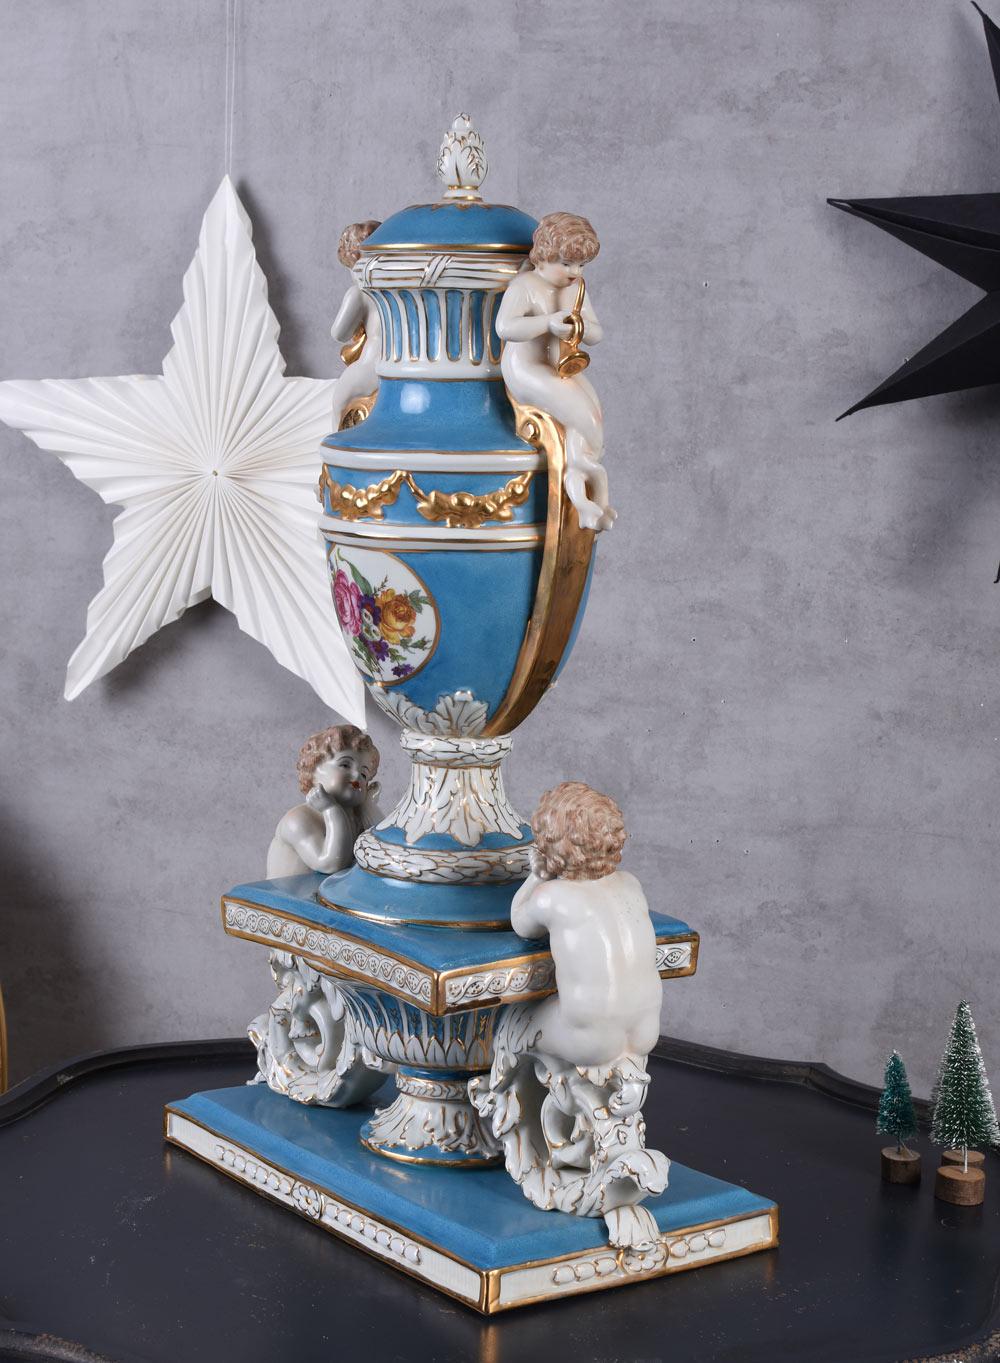 AMPHORE XXL ENGEL FIGUREN PORZELLAN Deckelvase Barock Vase Prunkgefäss Antik